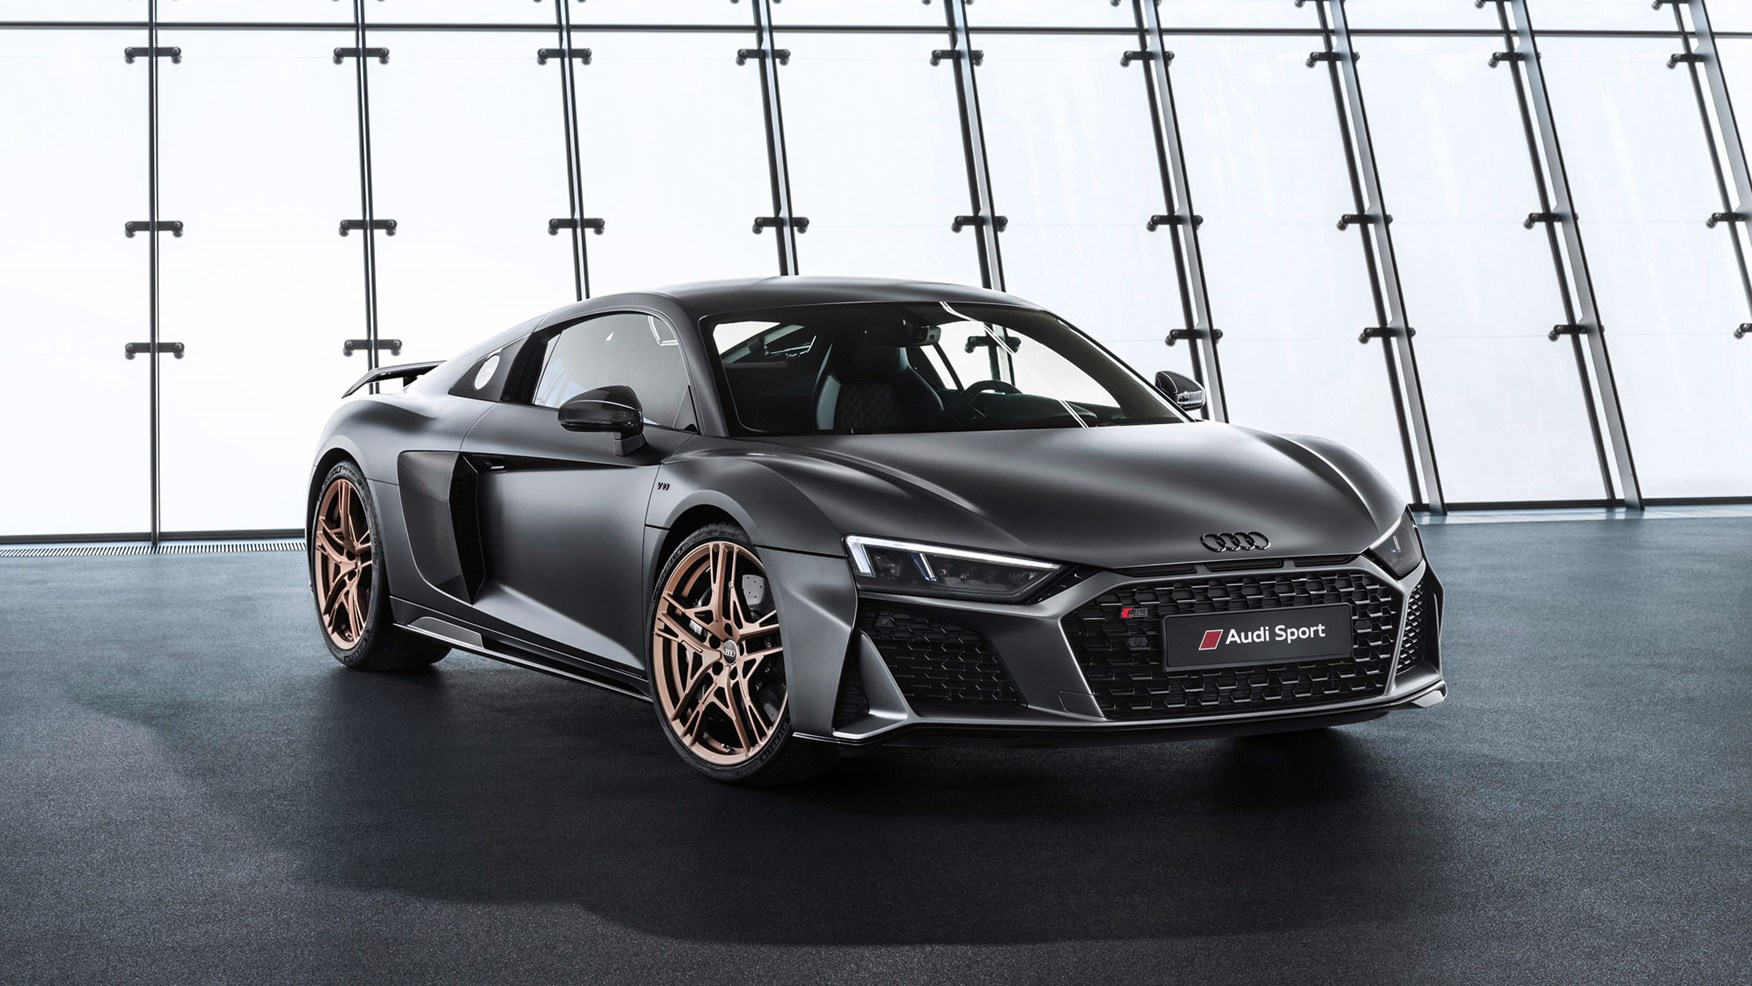 Kelebihan Kekurangan Audi R8 2019 Murah Berkualitas